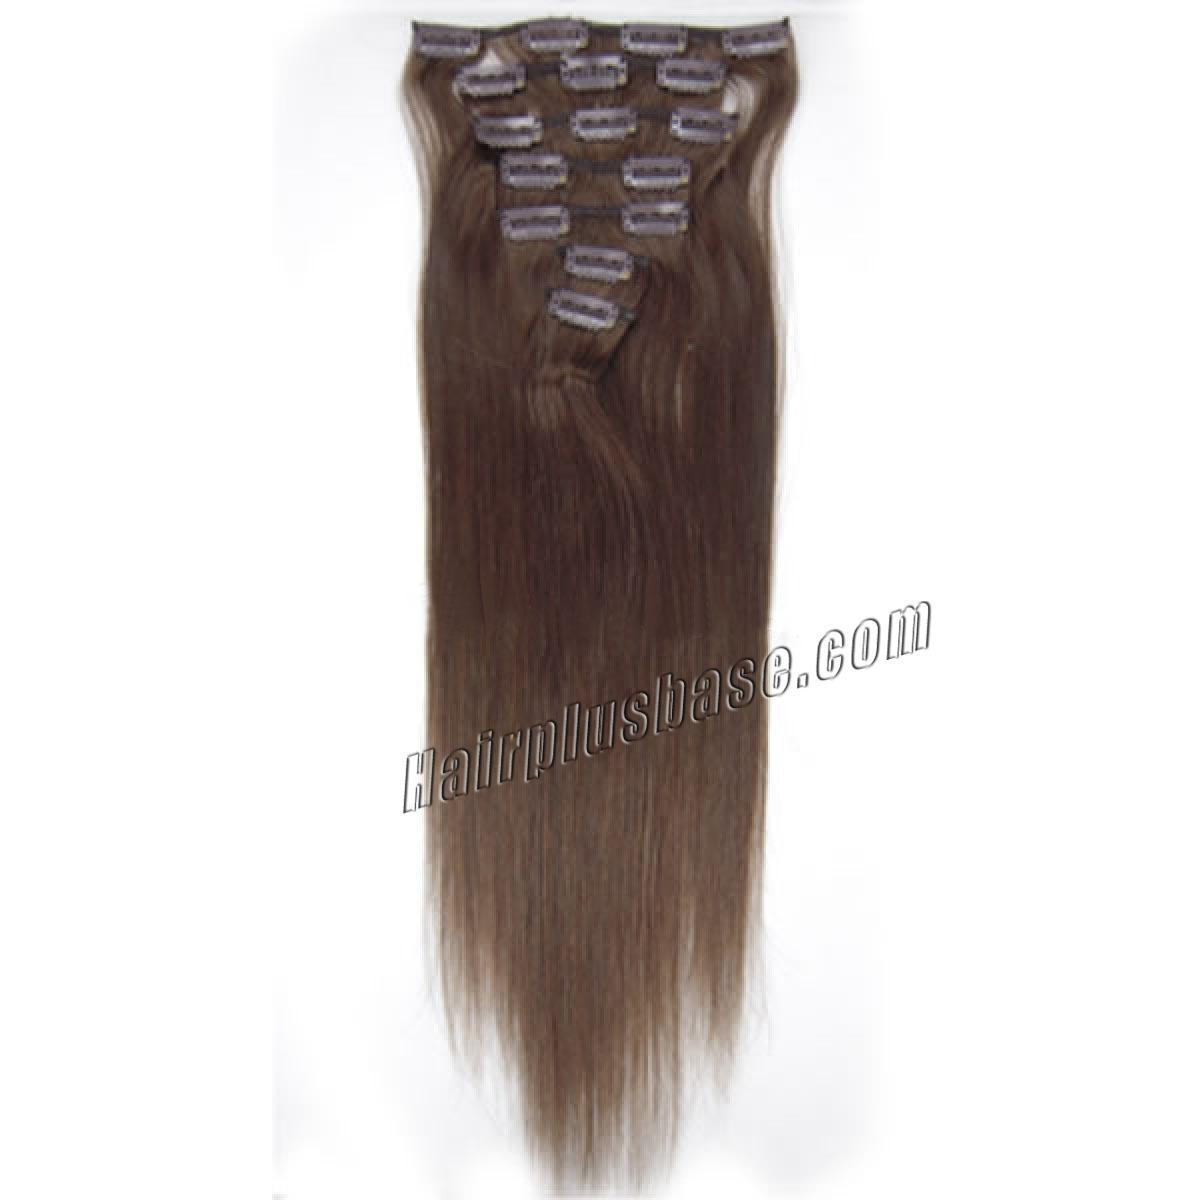 15 Inch #4 Medium Brown Clip In Human Hair Extensions 7pcs no 2